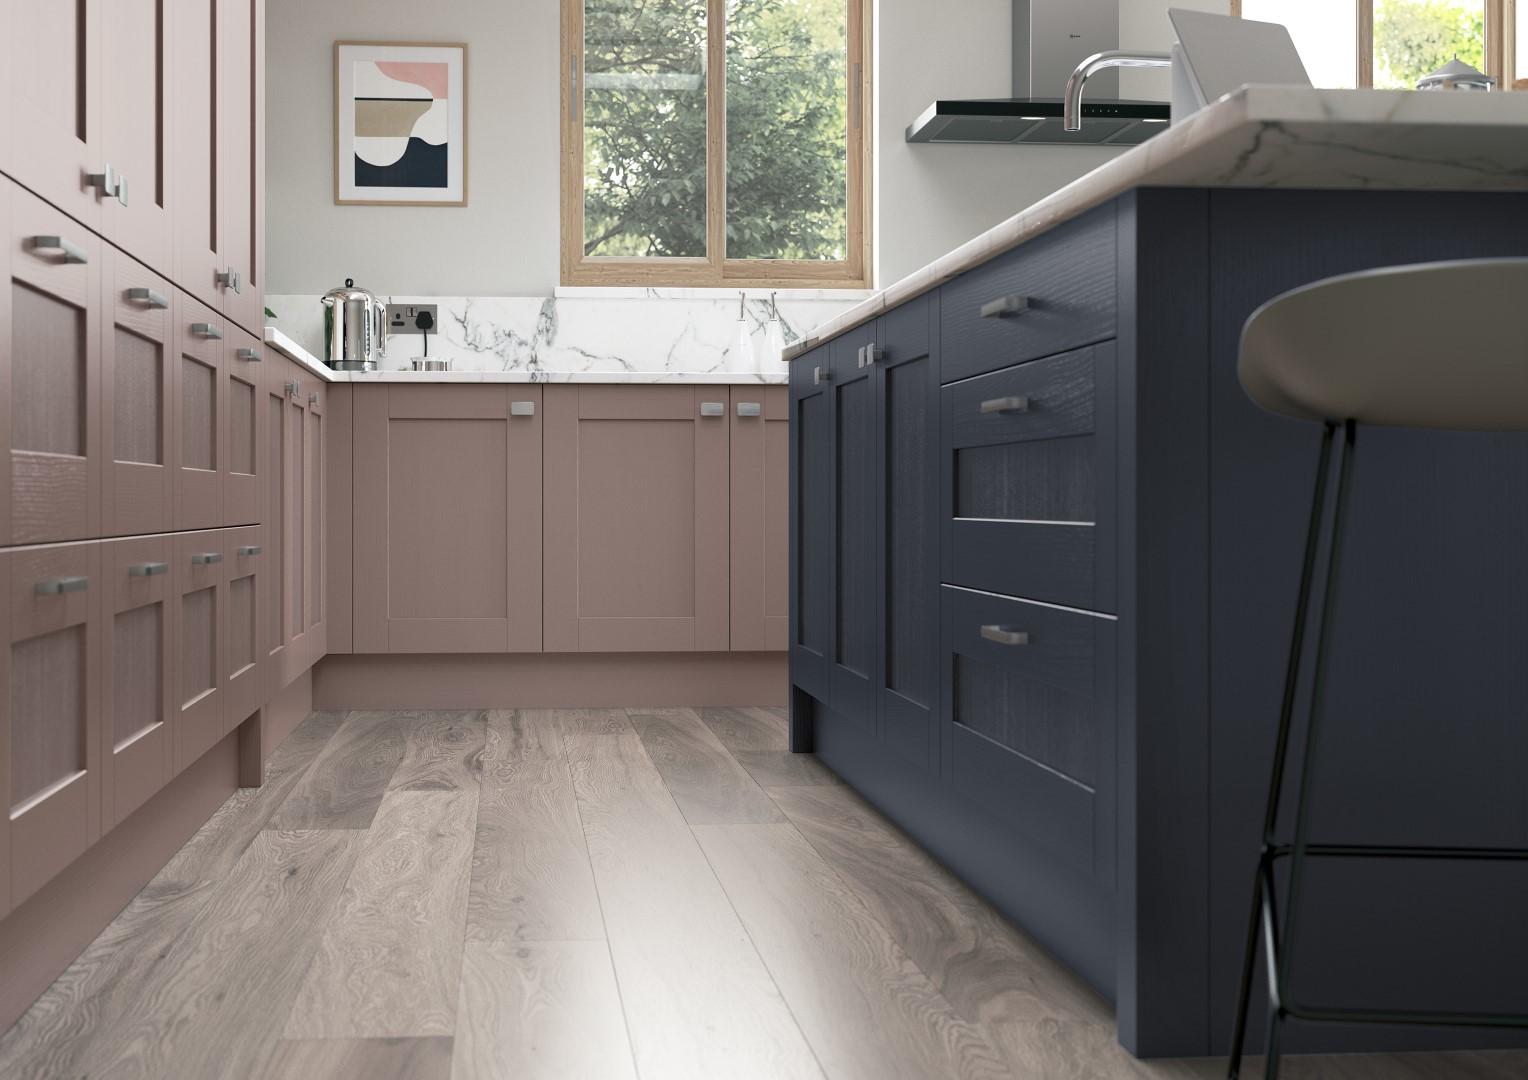 Madison Vintage Pink and Slate Blue - Kitchen Design - Alan Kelly Kitchens - Waterford - 2